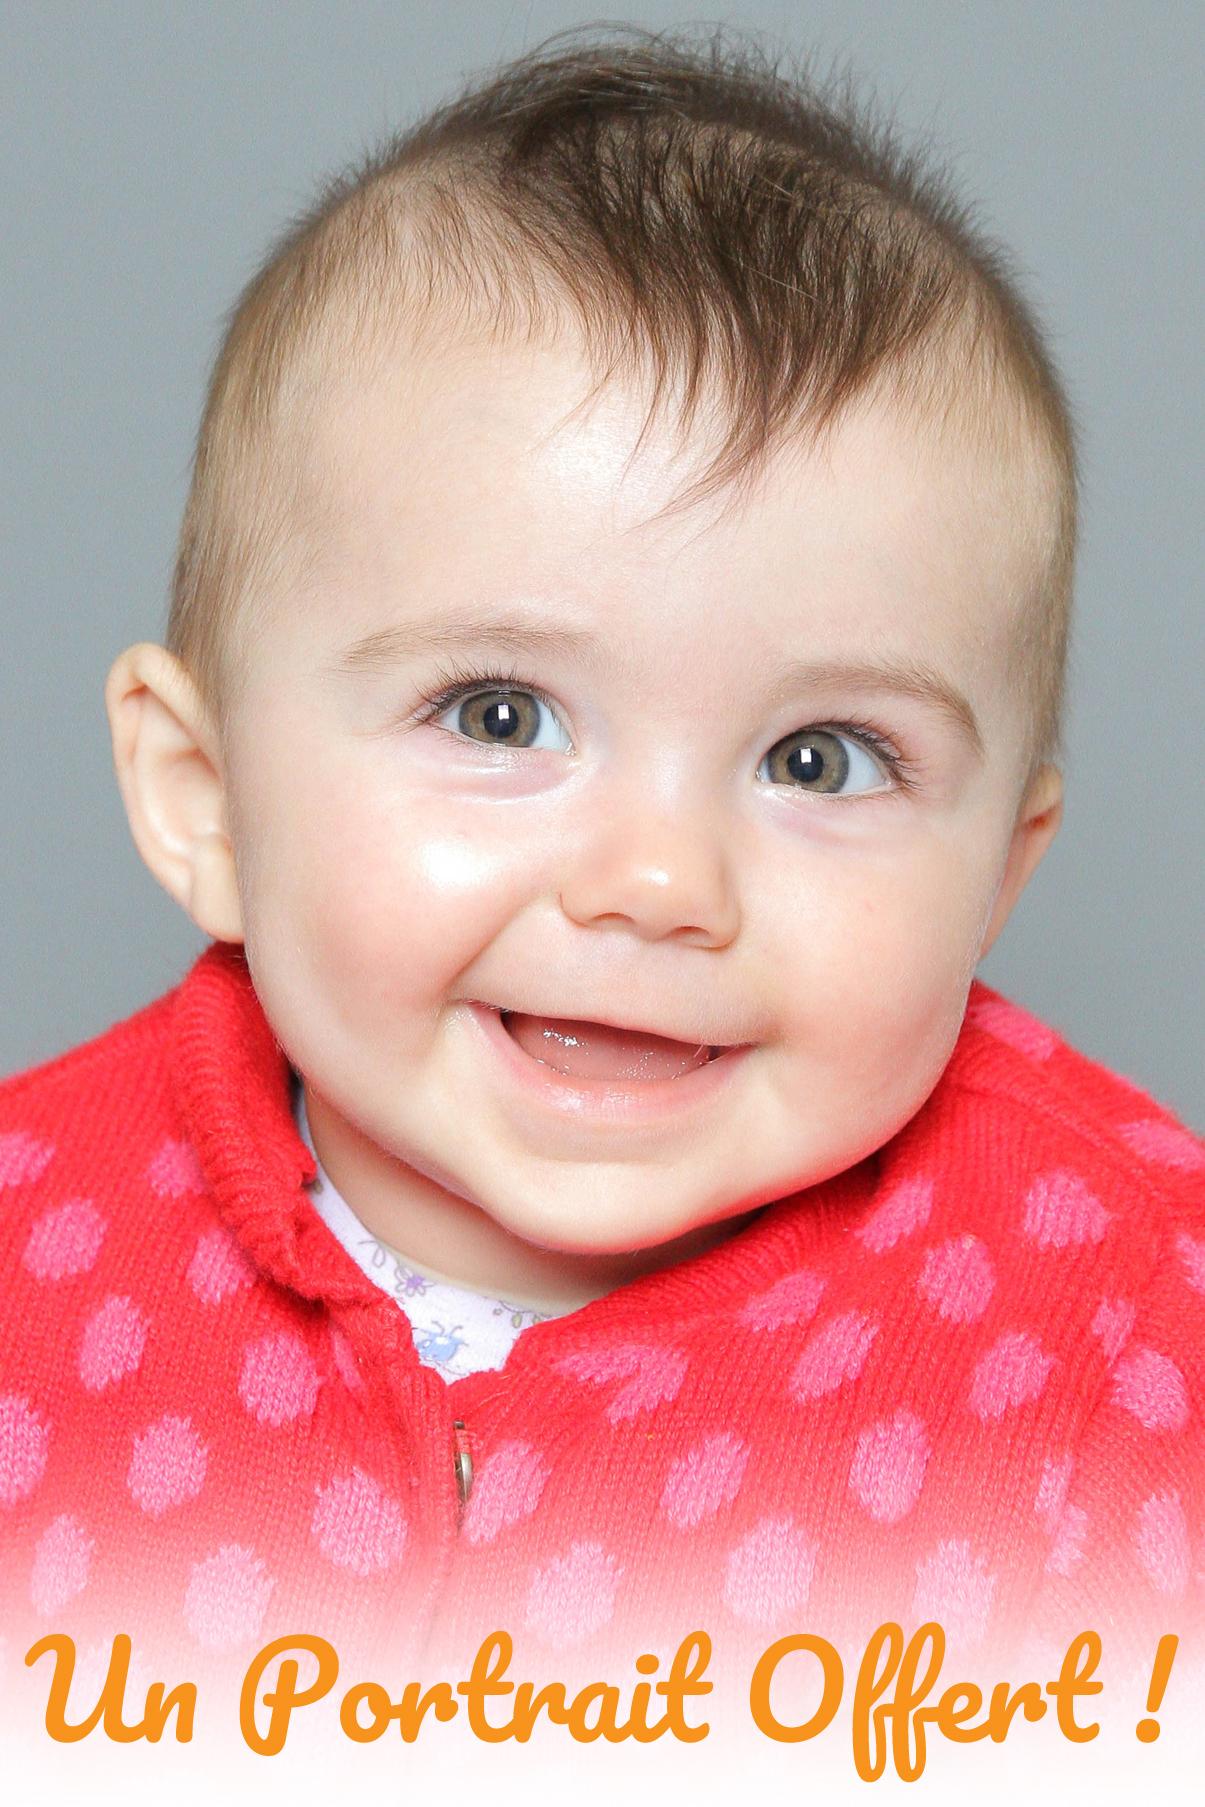 photos-identites-bebe-enfant-a-grenoble-cadeaux-portrait-bebe.jpg